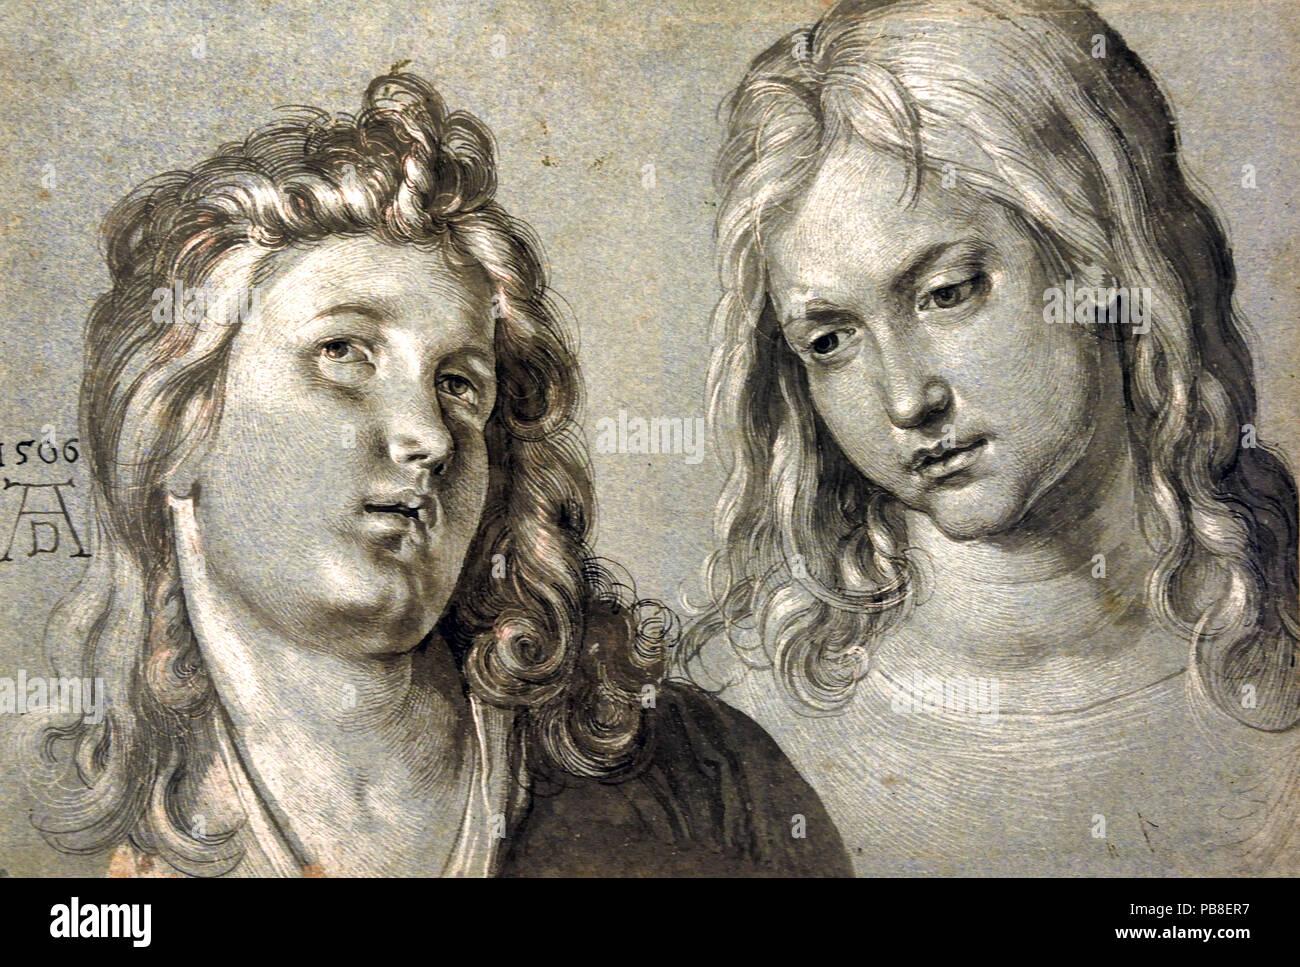 Zwei Engel Köpfe 1506 Albrecht Dürer 1471 - 1528 Deutscher Deutschland Stockbild